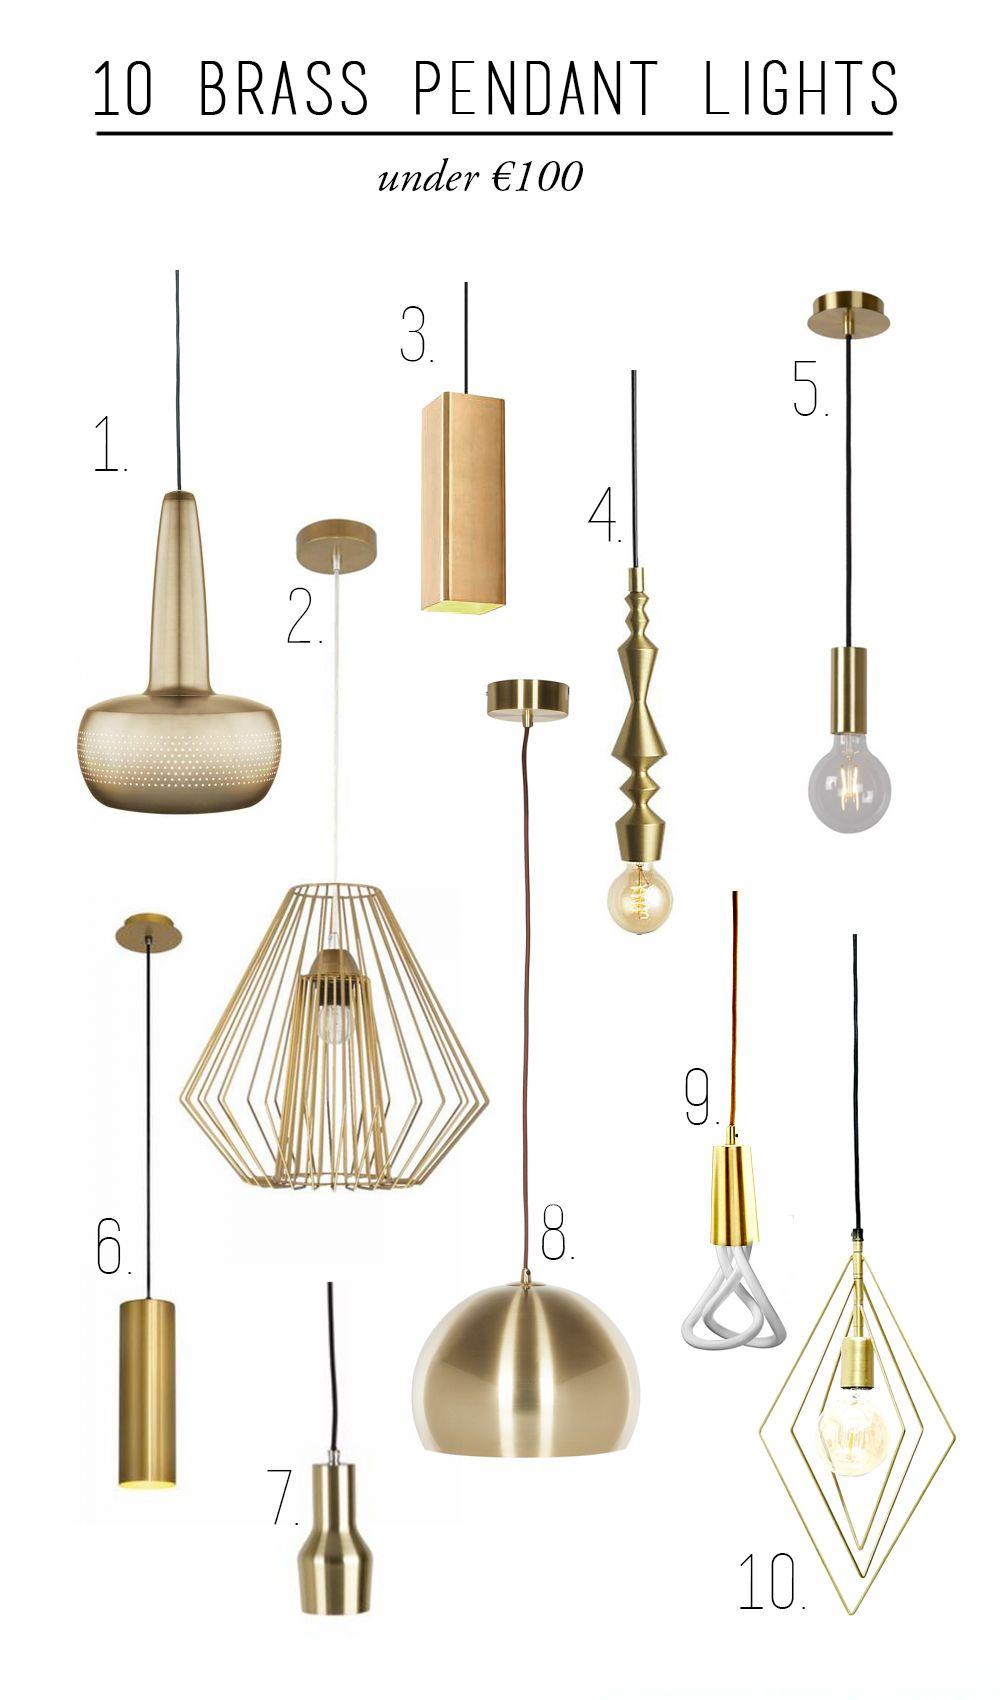 10 brass pendant lights under 100 h o m e meadowood 10 brass pendant lights under 100 aloadofball Image collections